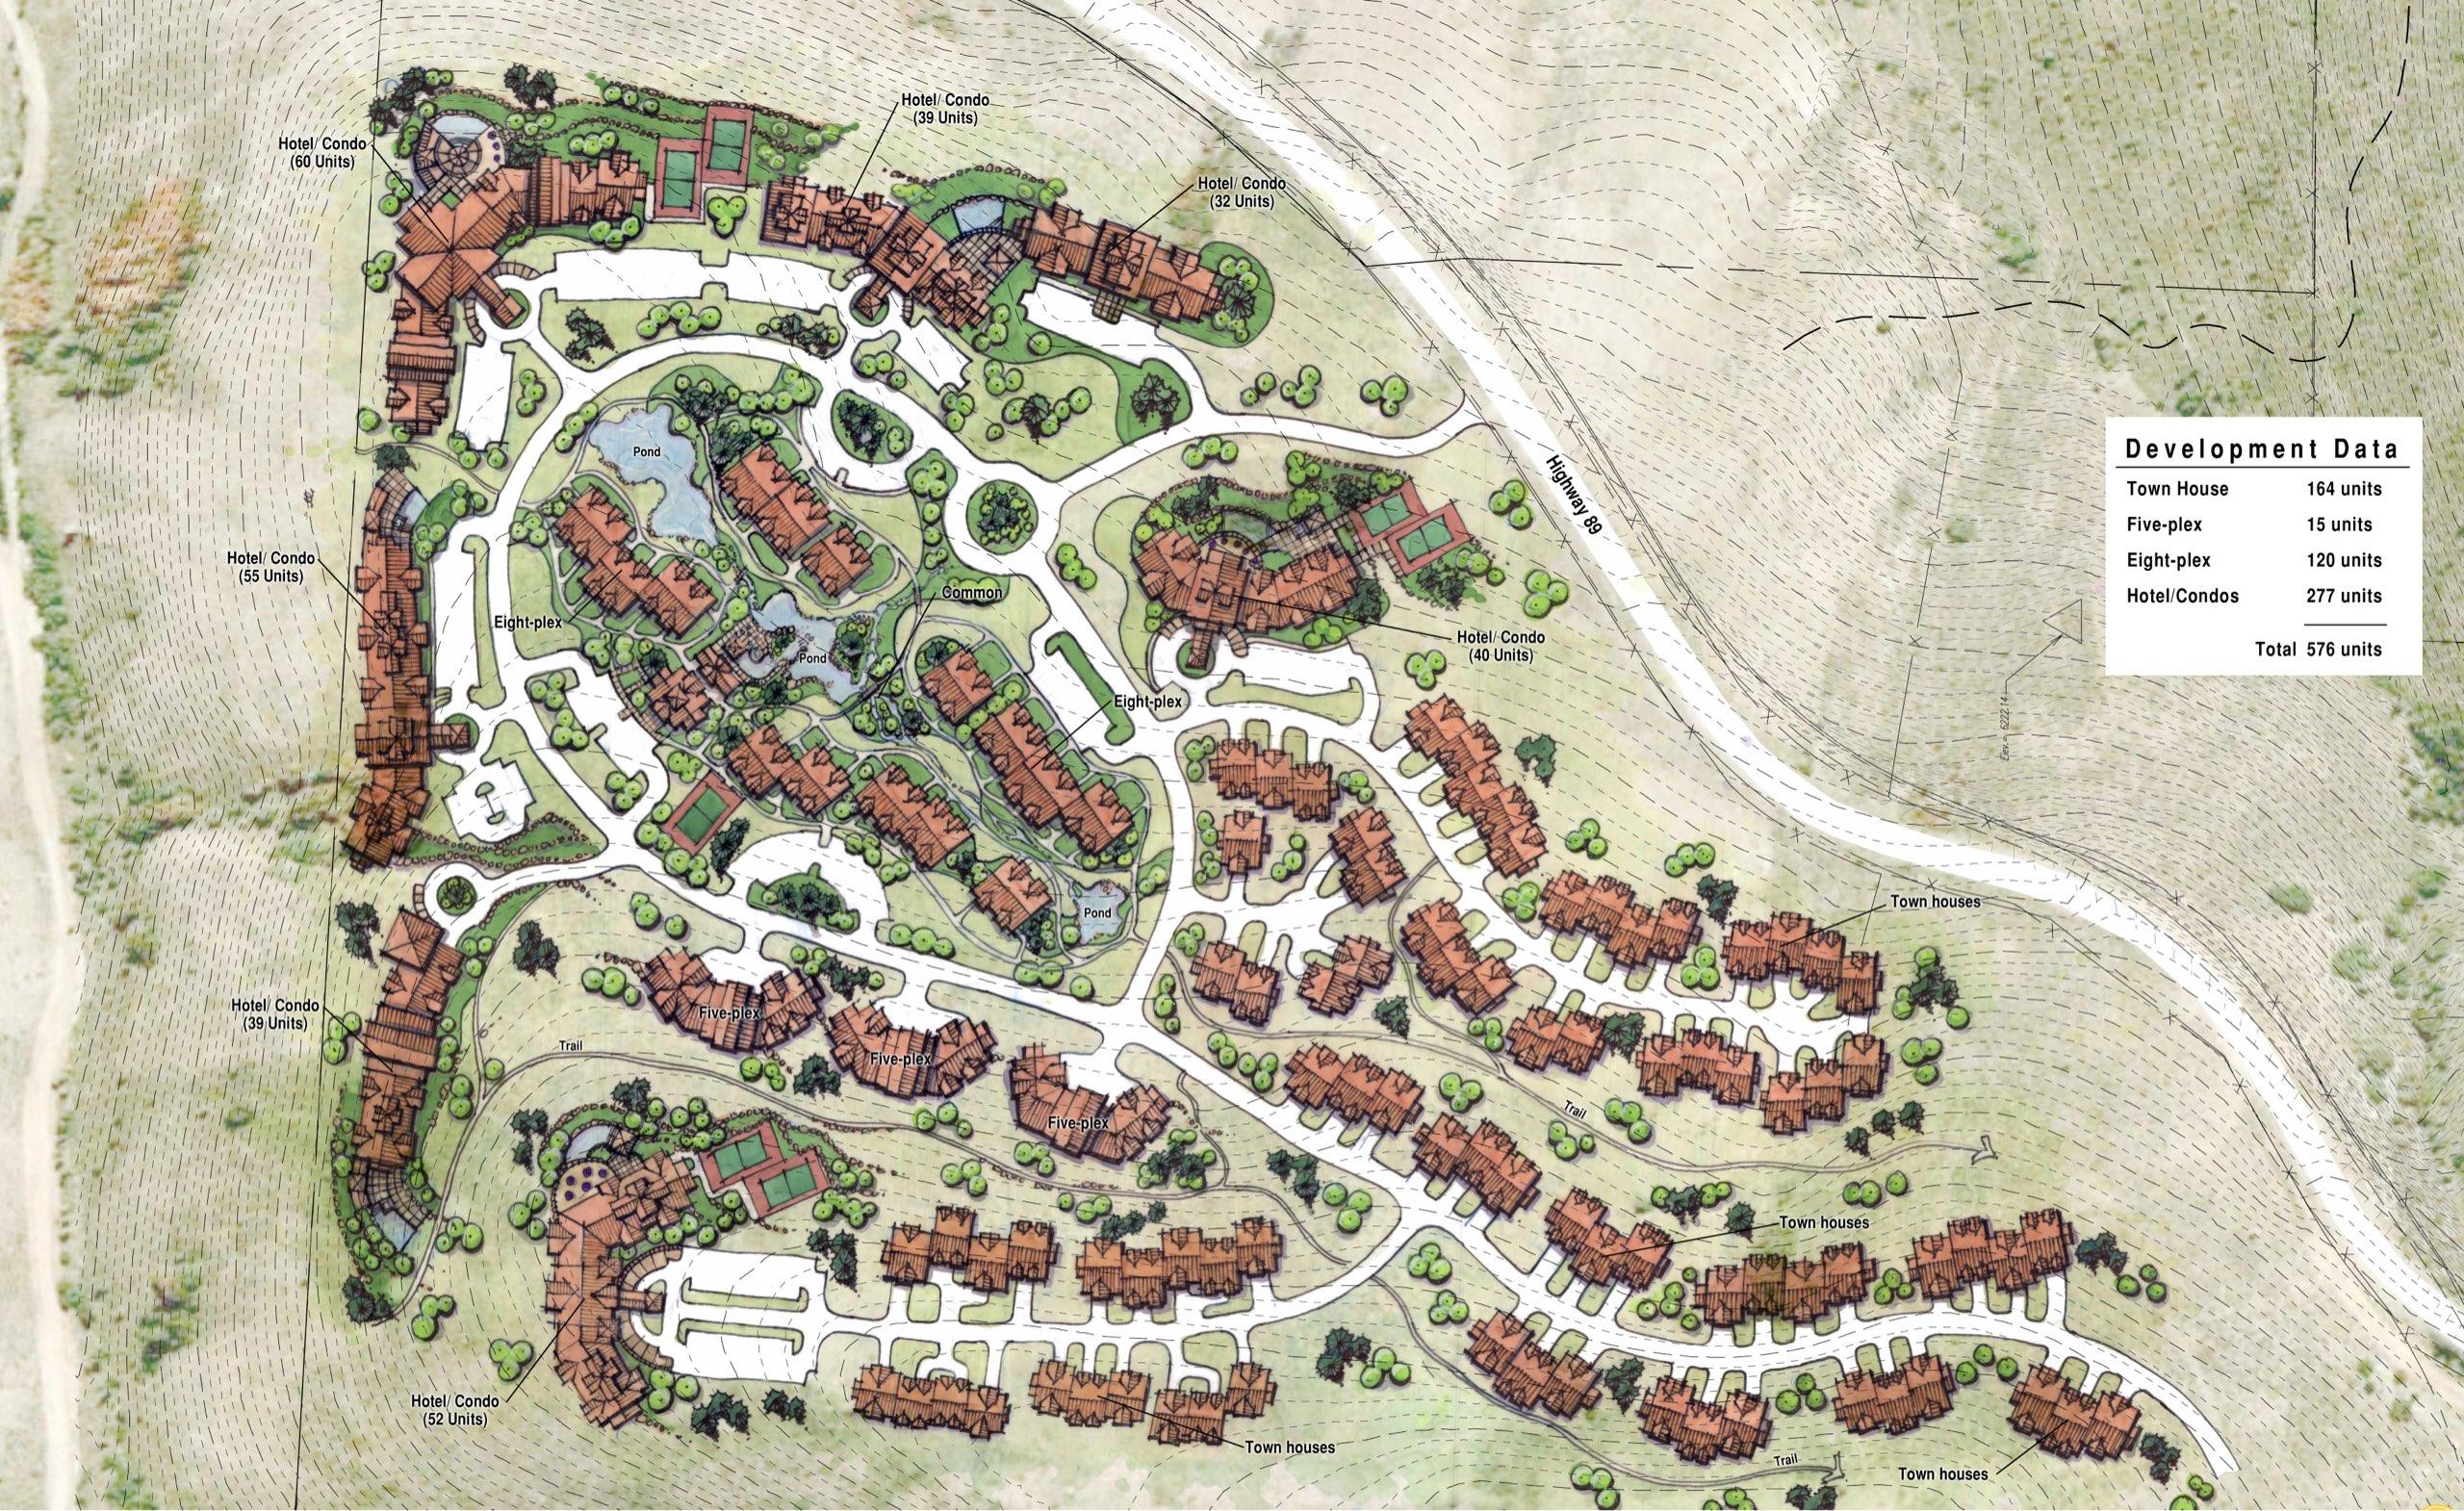 Shundahai village plan at Bear Lake in Utah, architectural design by Shundahai village plan at Bear Lake in Utah, architectural design by Elliott Workgroup